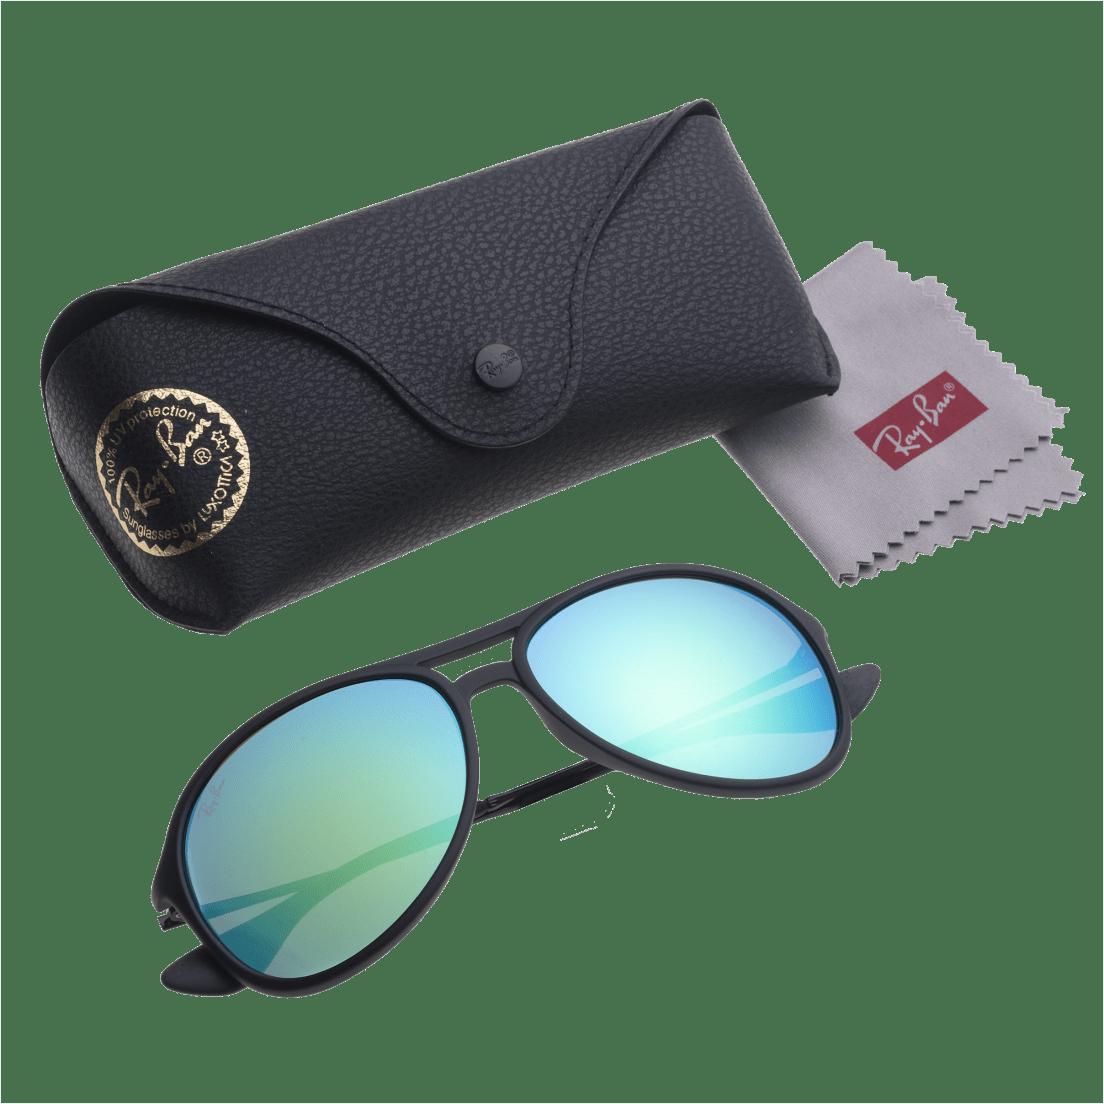 86845fc950 Ray-Ban RB4201 Alex Pilot Sunglasses